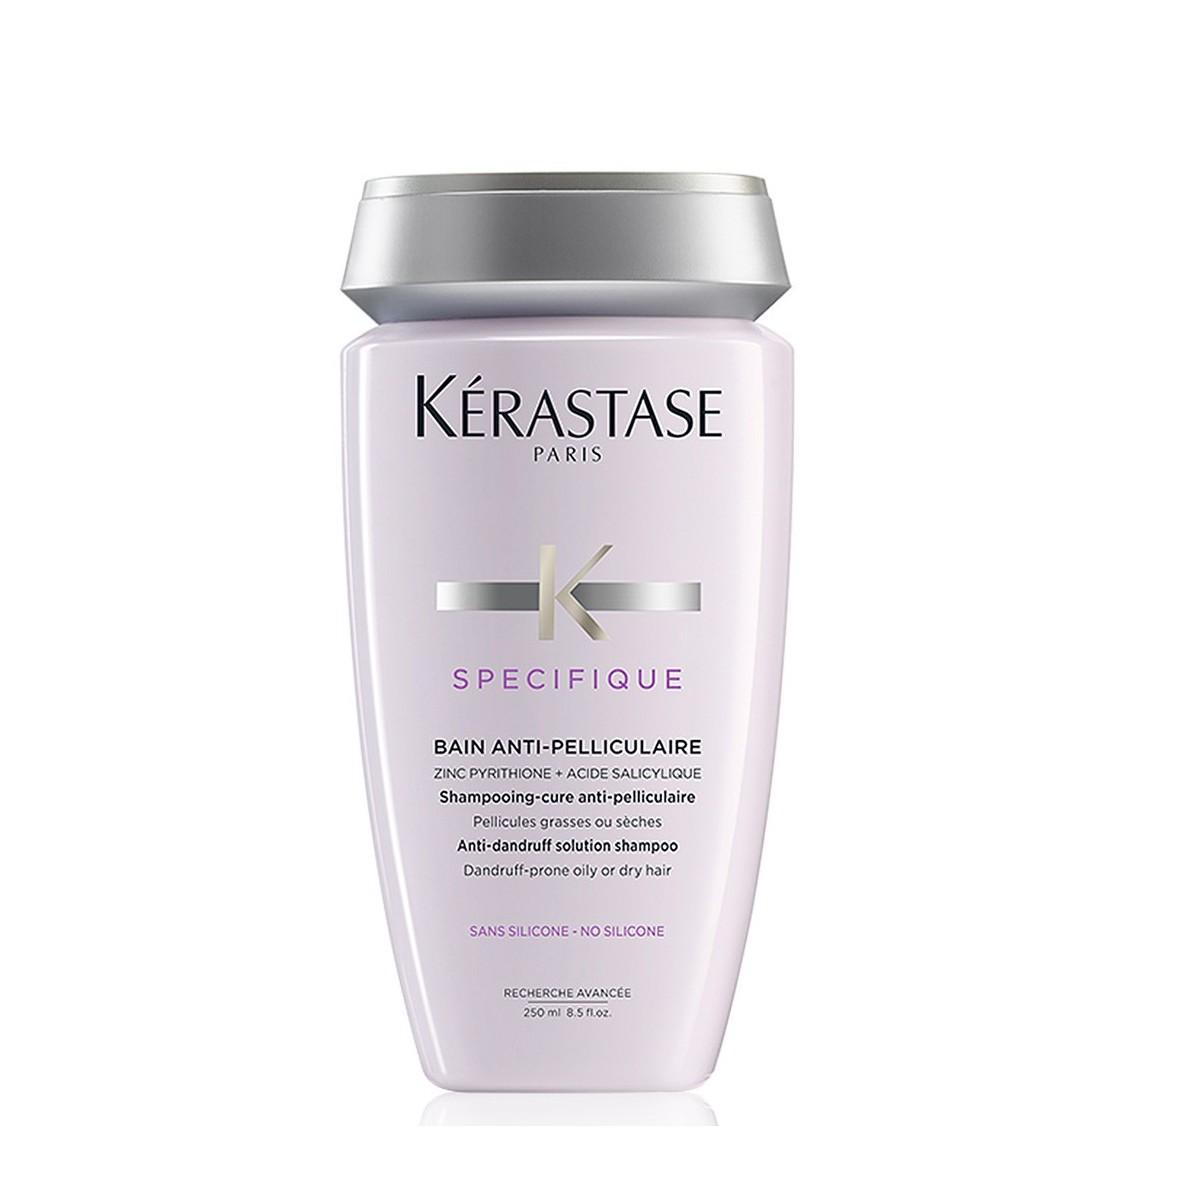 Kérastase Spécifique Bain Anti-Pelliculaire - Shampoo 250ml - CA